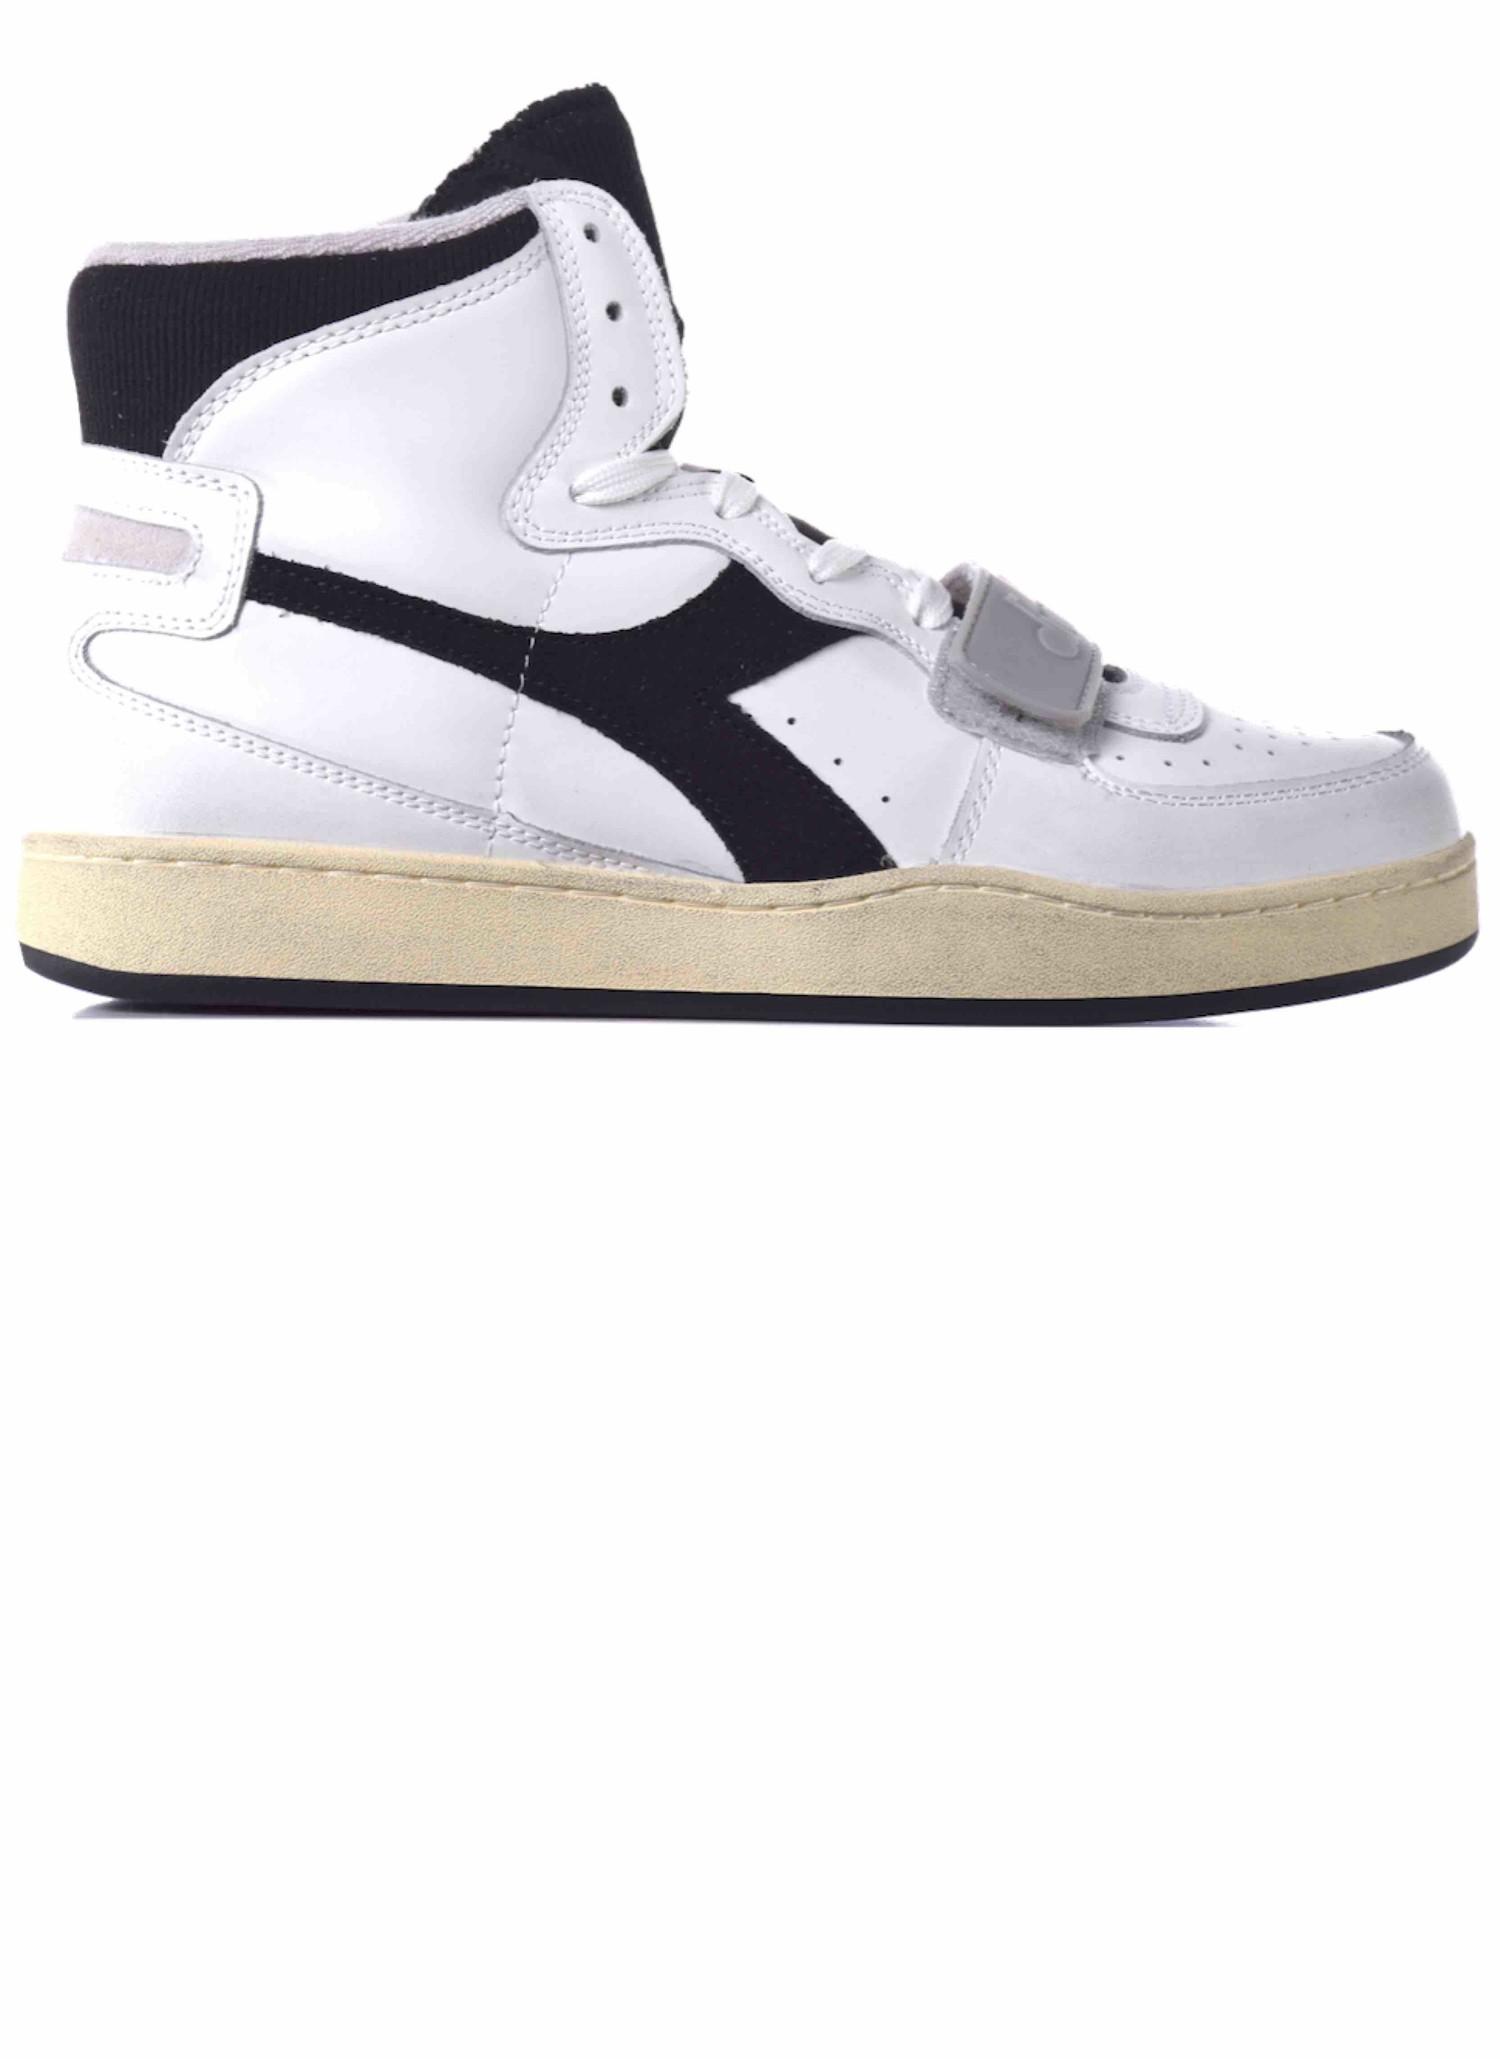 Diadora Basket High Sneakers White